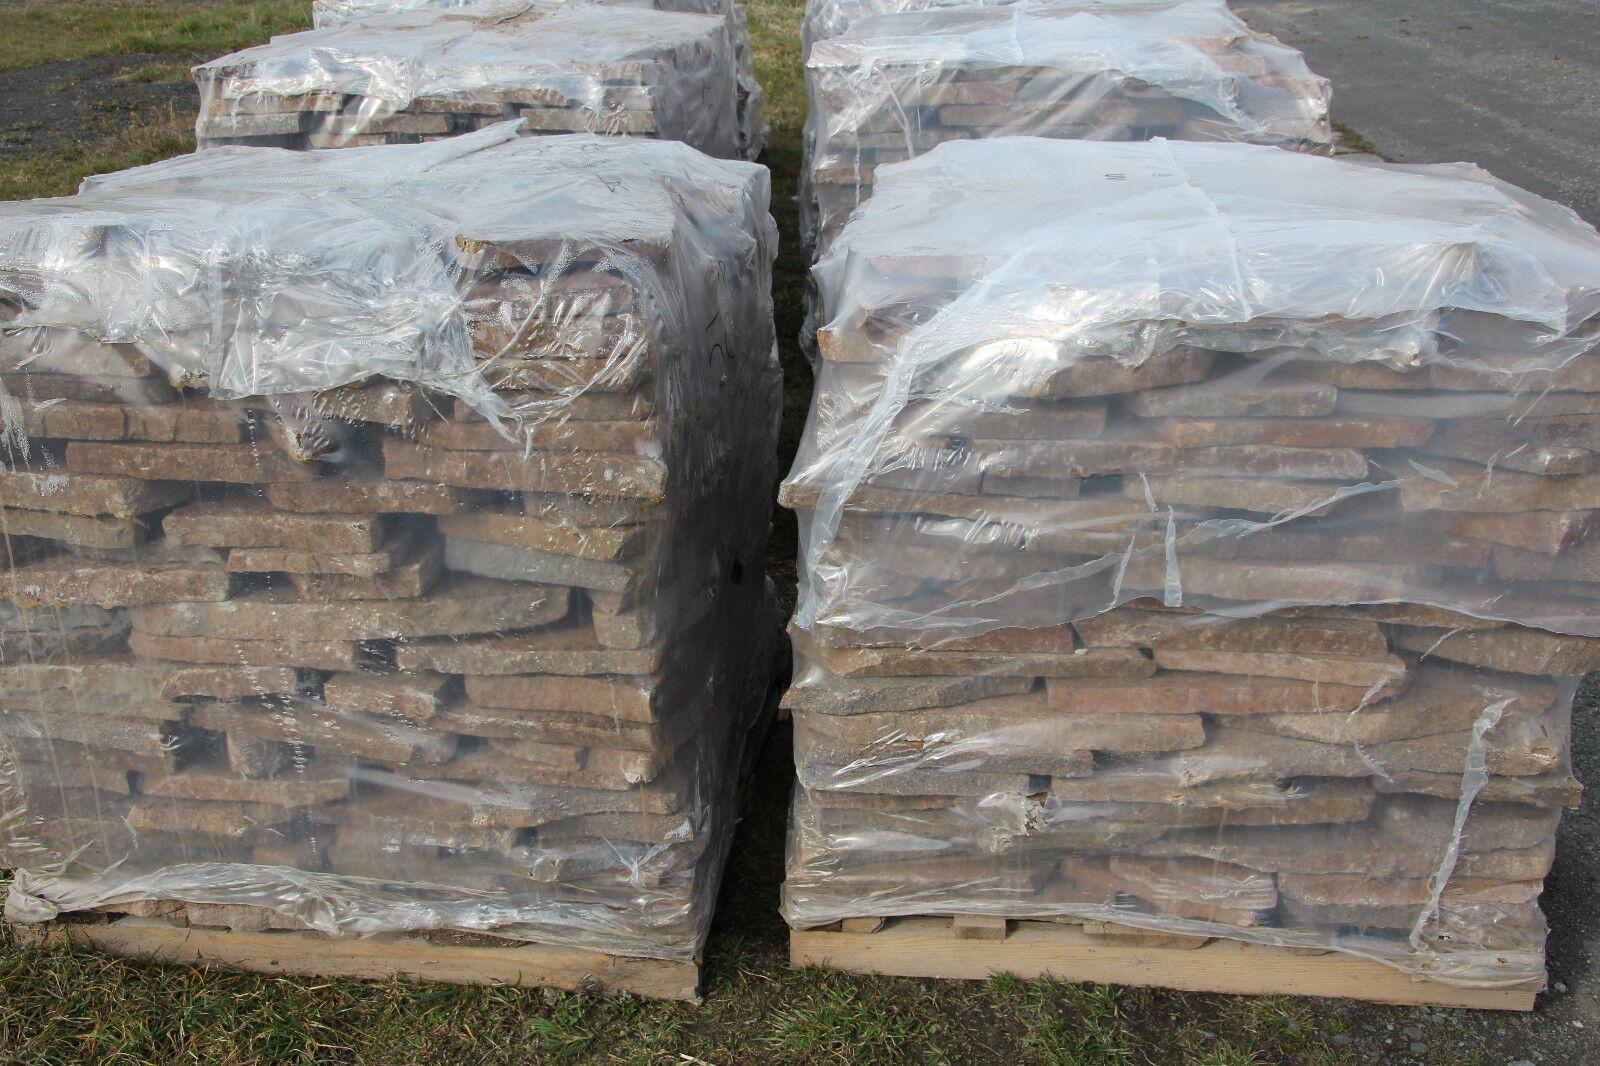 porphyr polygonalplatten bruchplatten natursteinplatten bruchsteinplatten 3 5cm eur 800 00. Black Bedroom Furniture Sets. Home Design Ideas